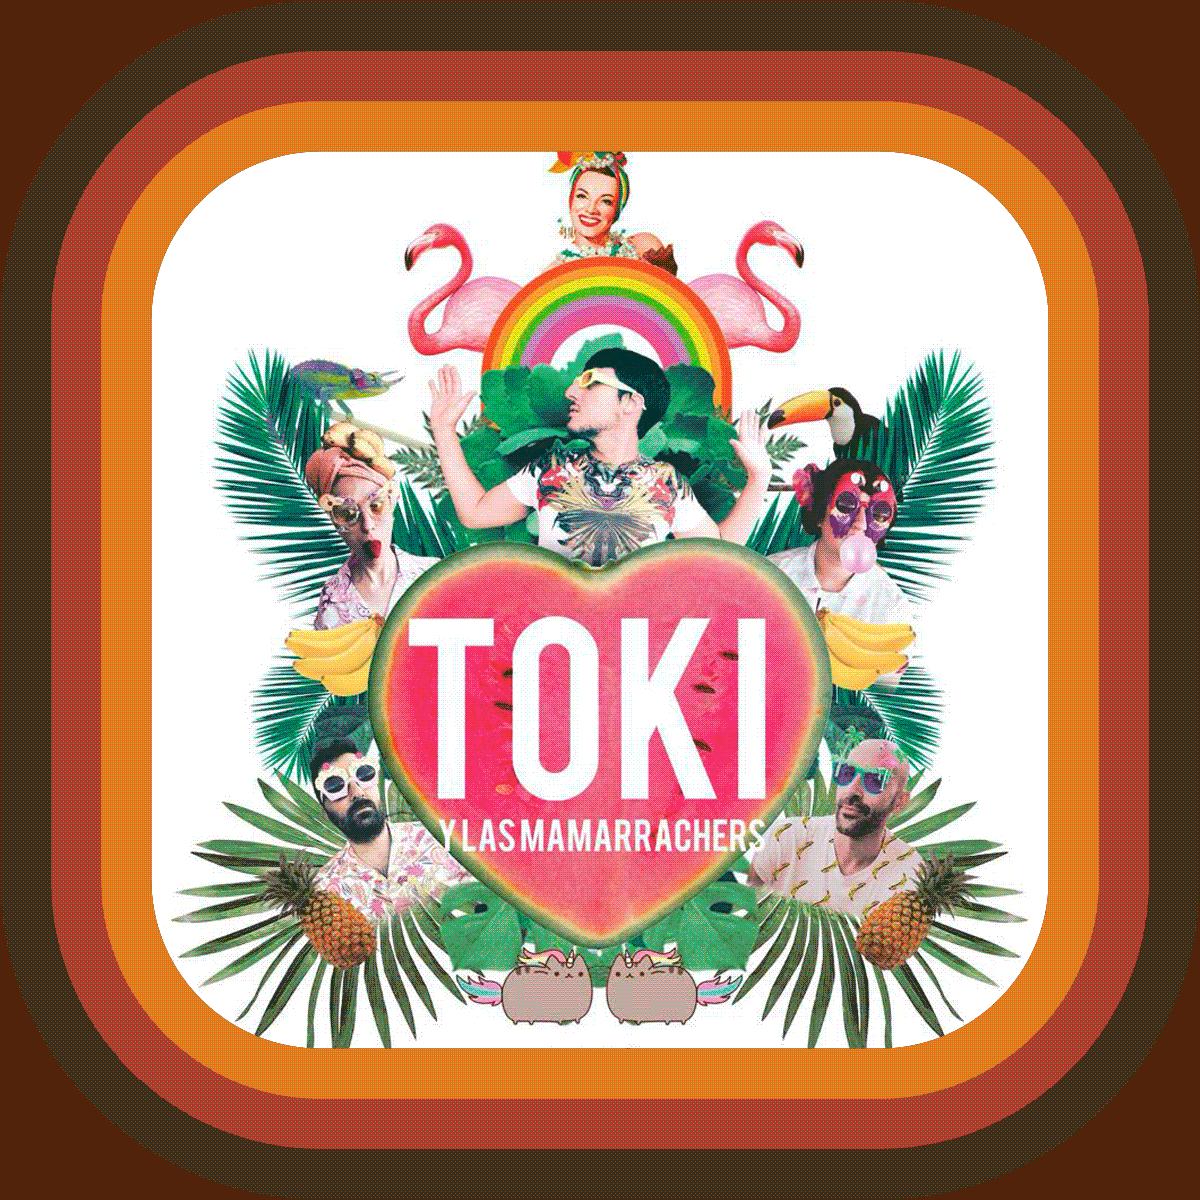 Tokio DJ & The Mamarrachers